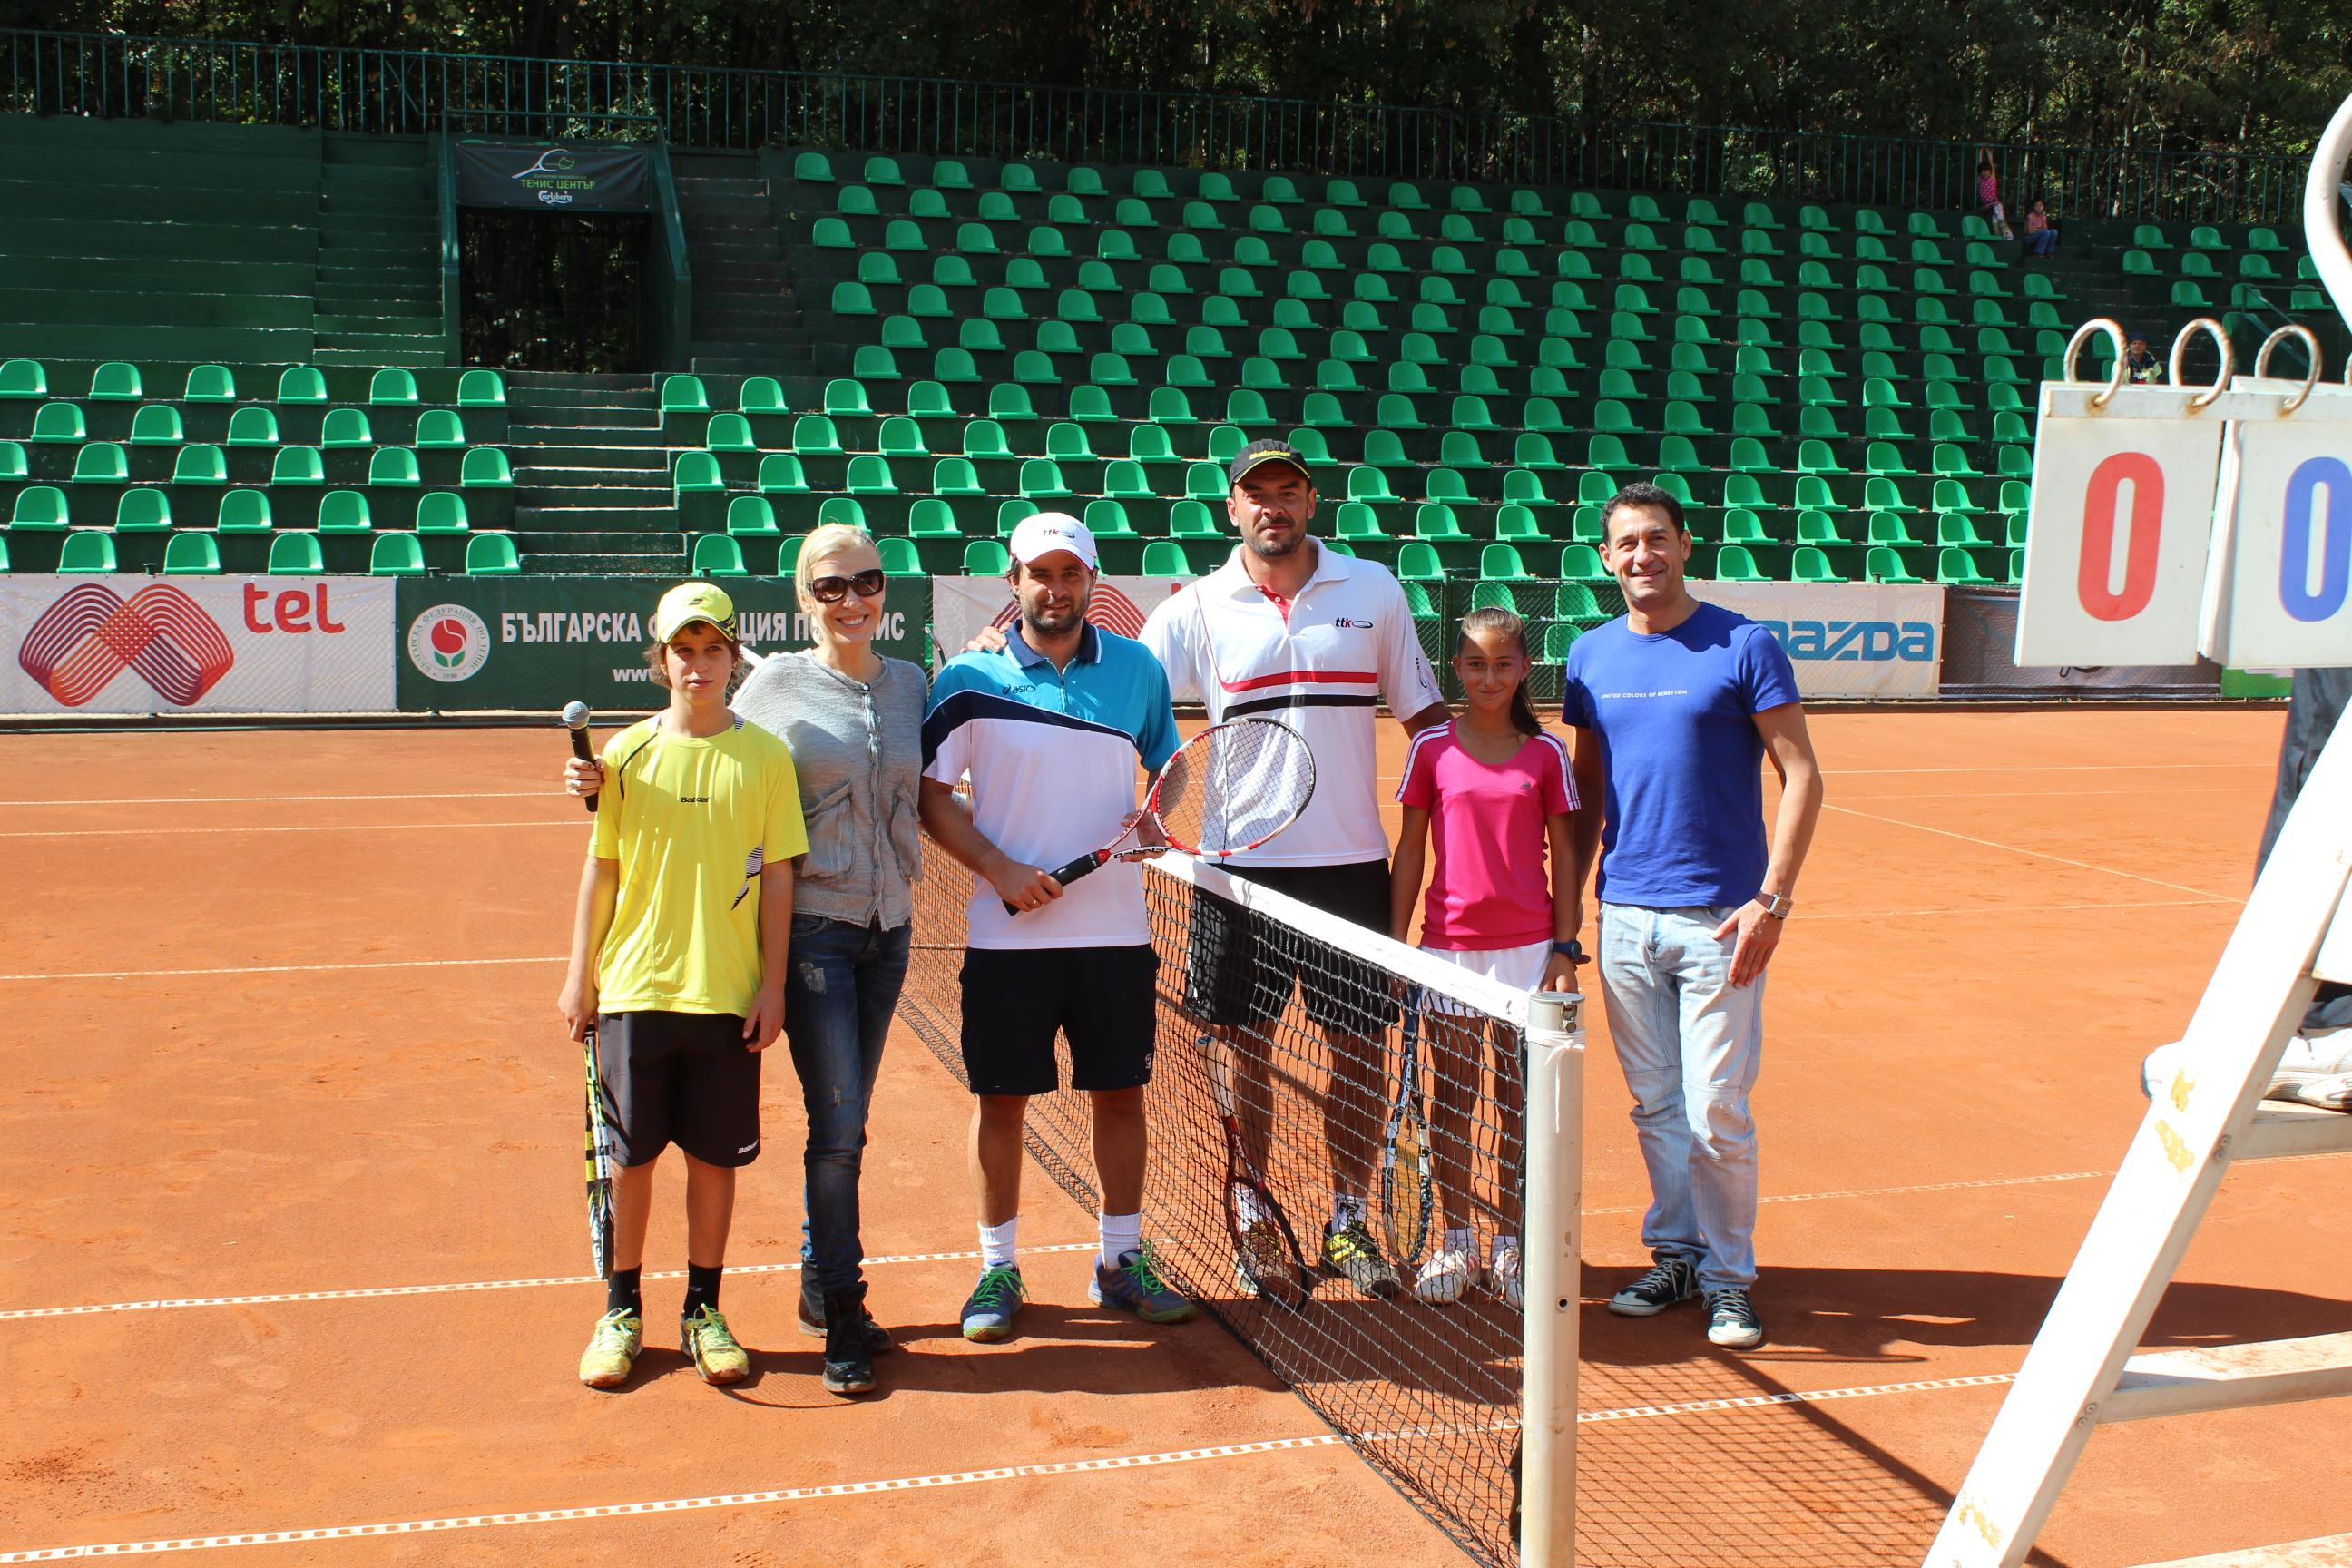 Тенис празник за деца аутисти на кортовете на БНТЦ